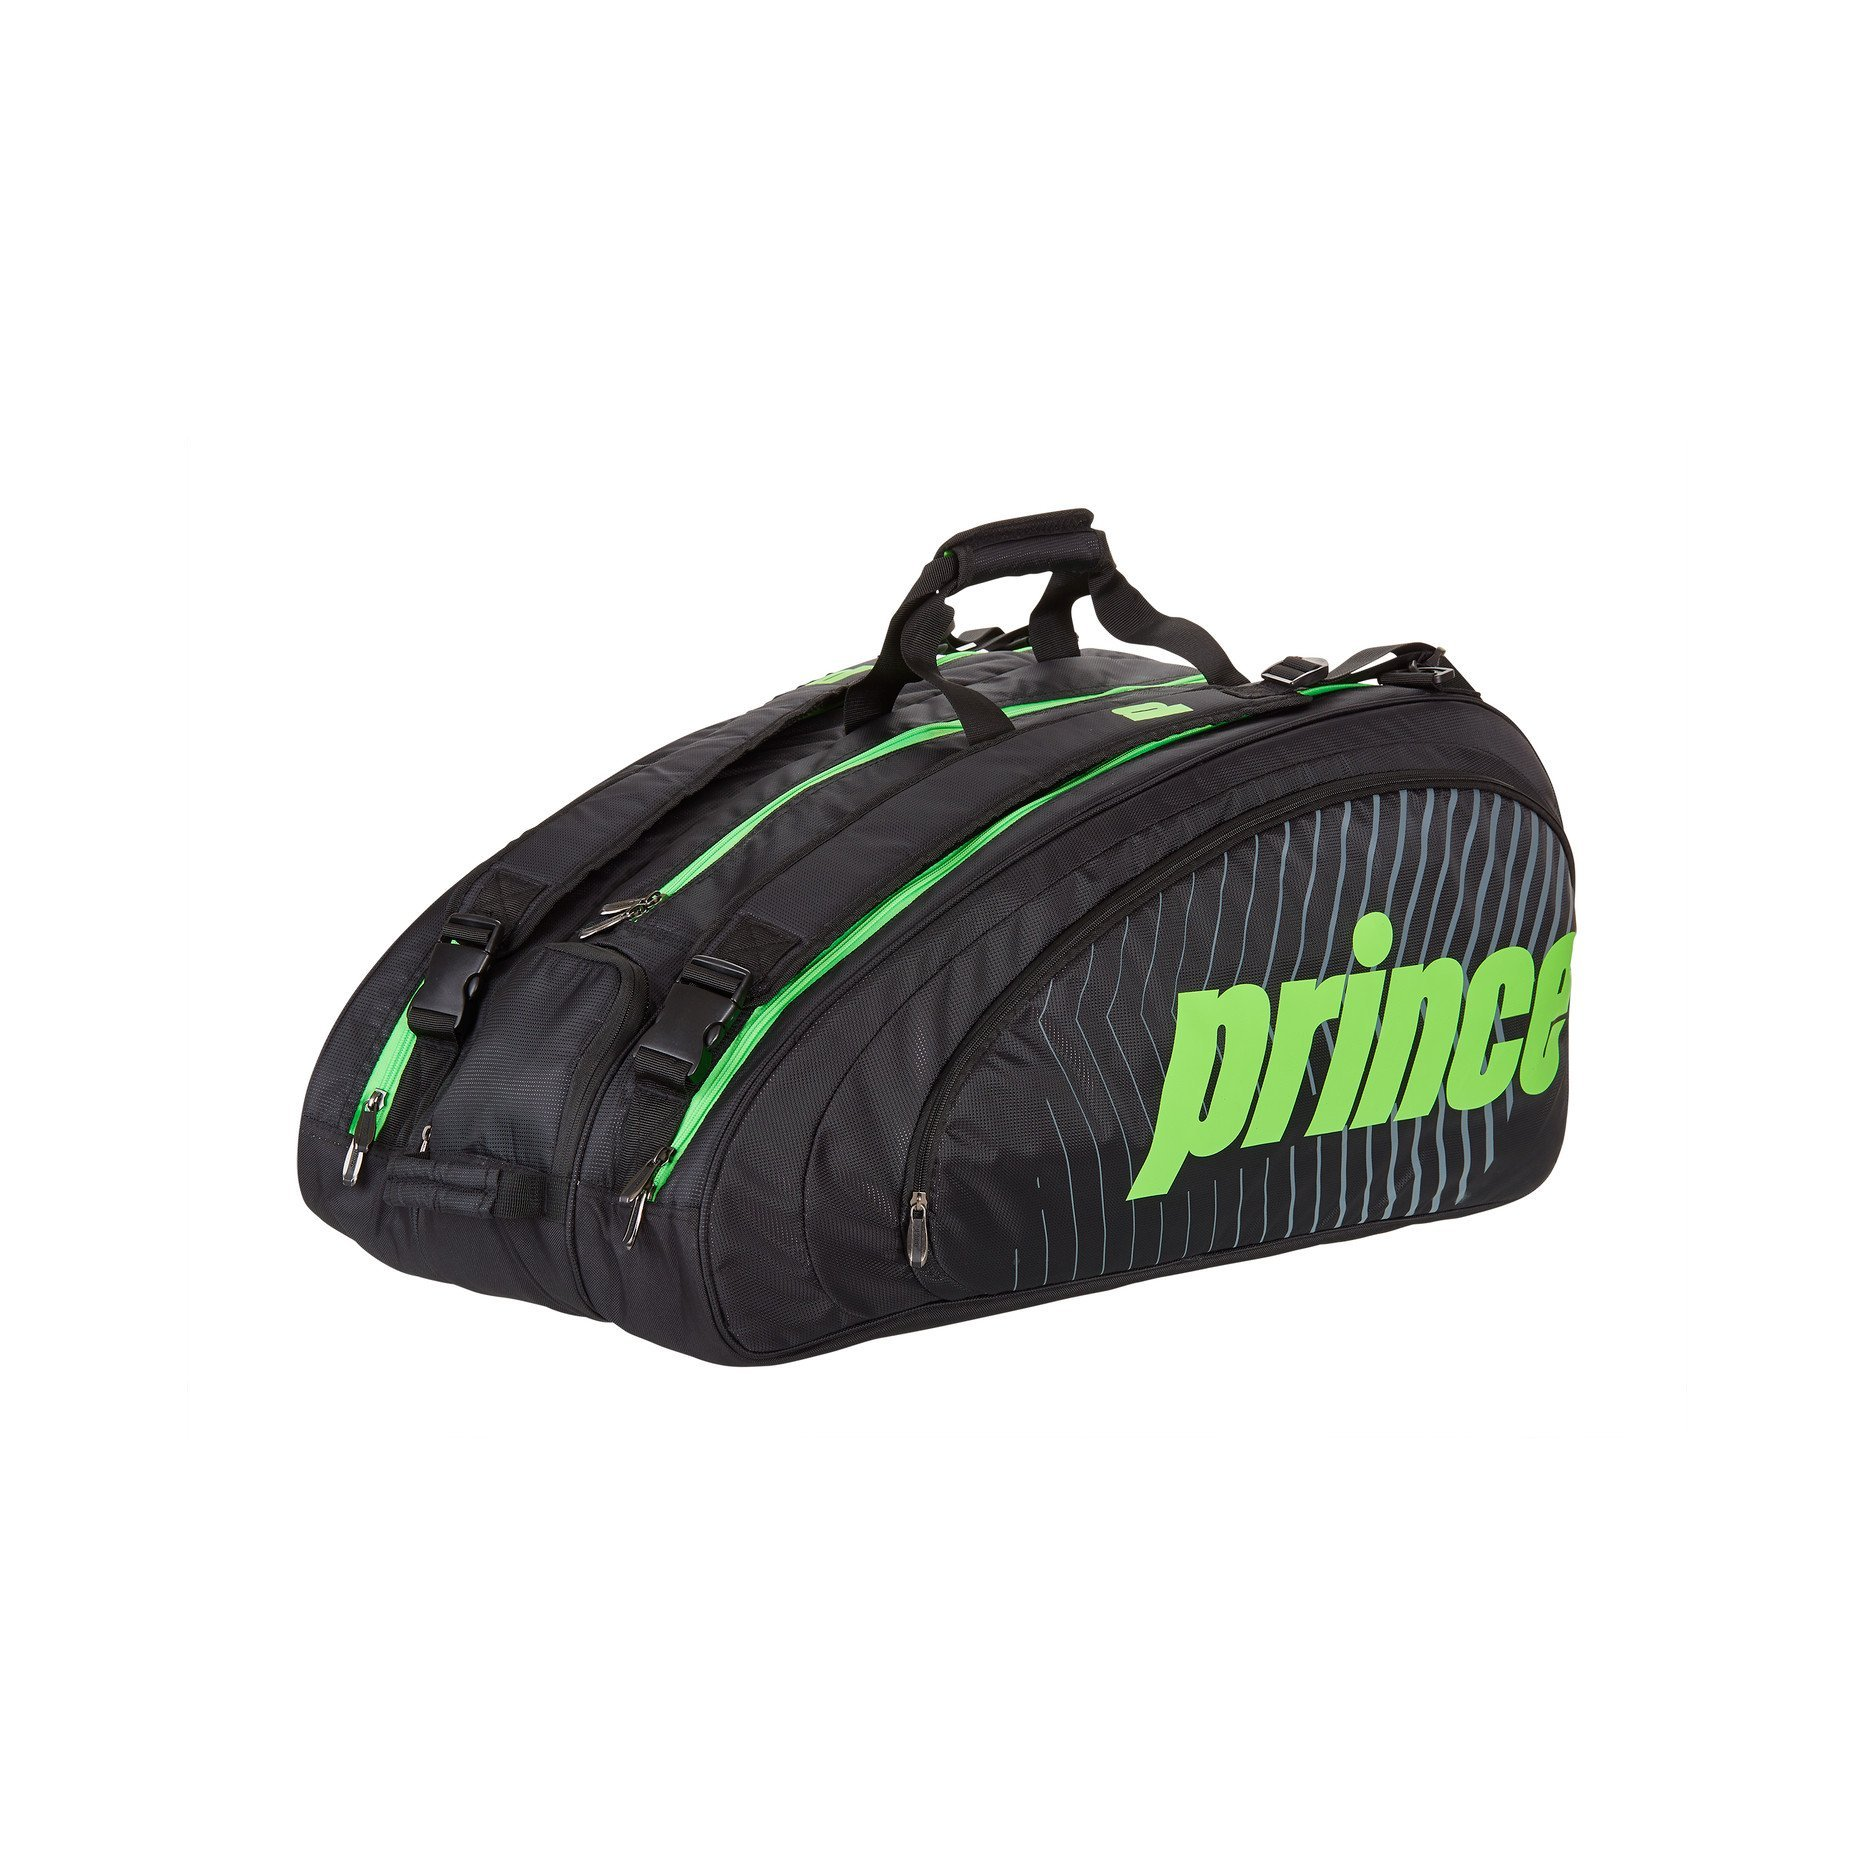 Prince Tennis Bag – Tour Challenger (Black & Green)